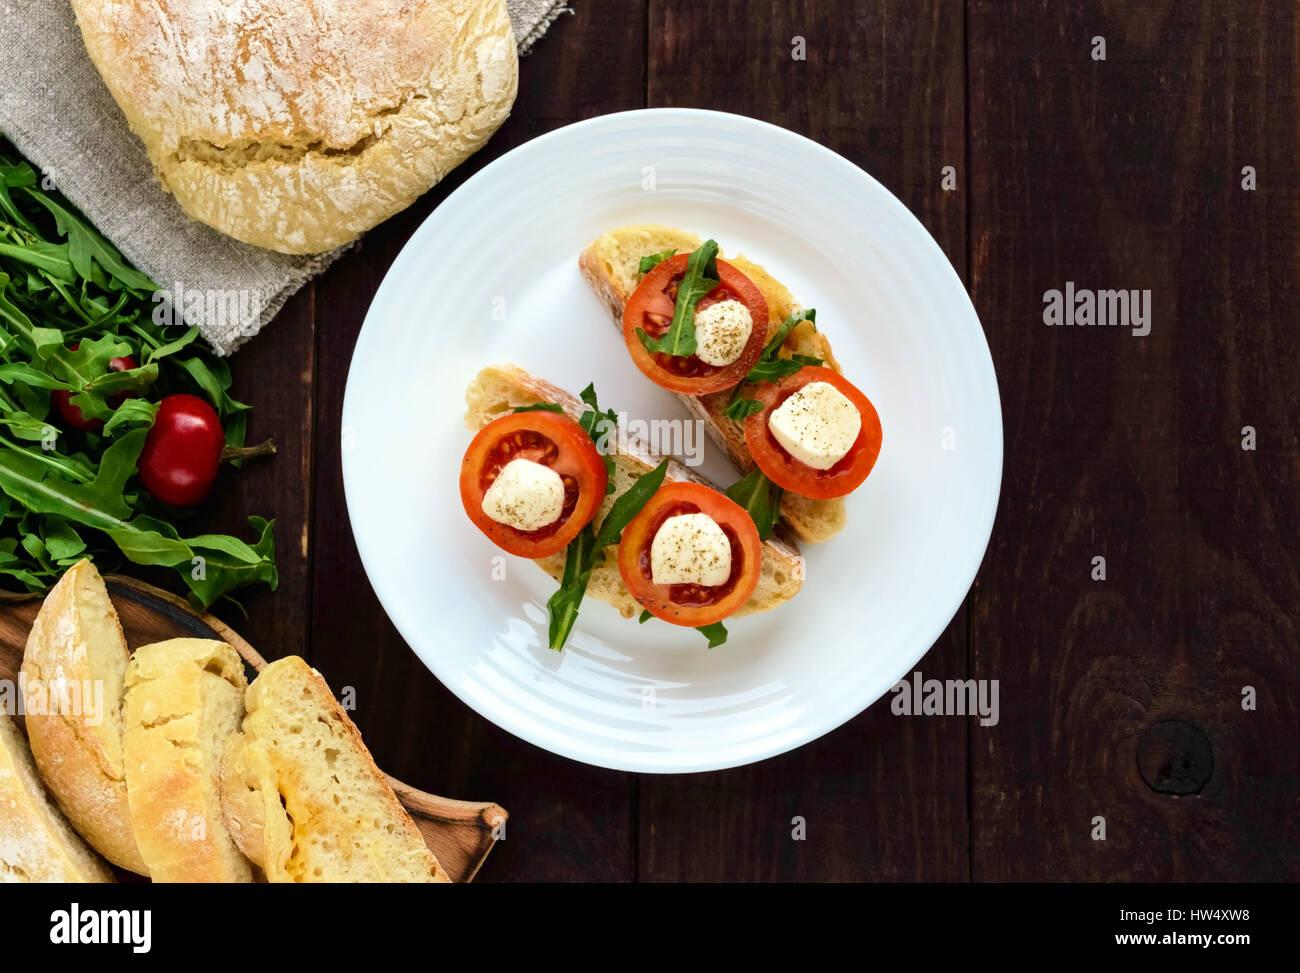 Bruschetta with arugula, tomatoes, mozzarella, olive oil on slices of chiabatta. Light breakfast. The top view - Stock Image